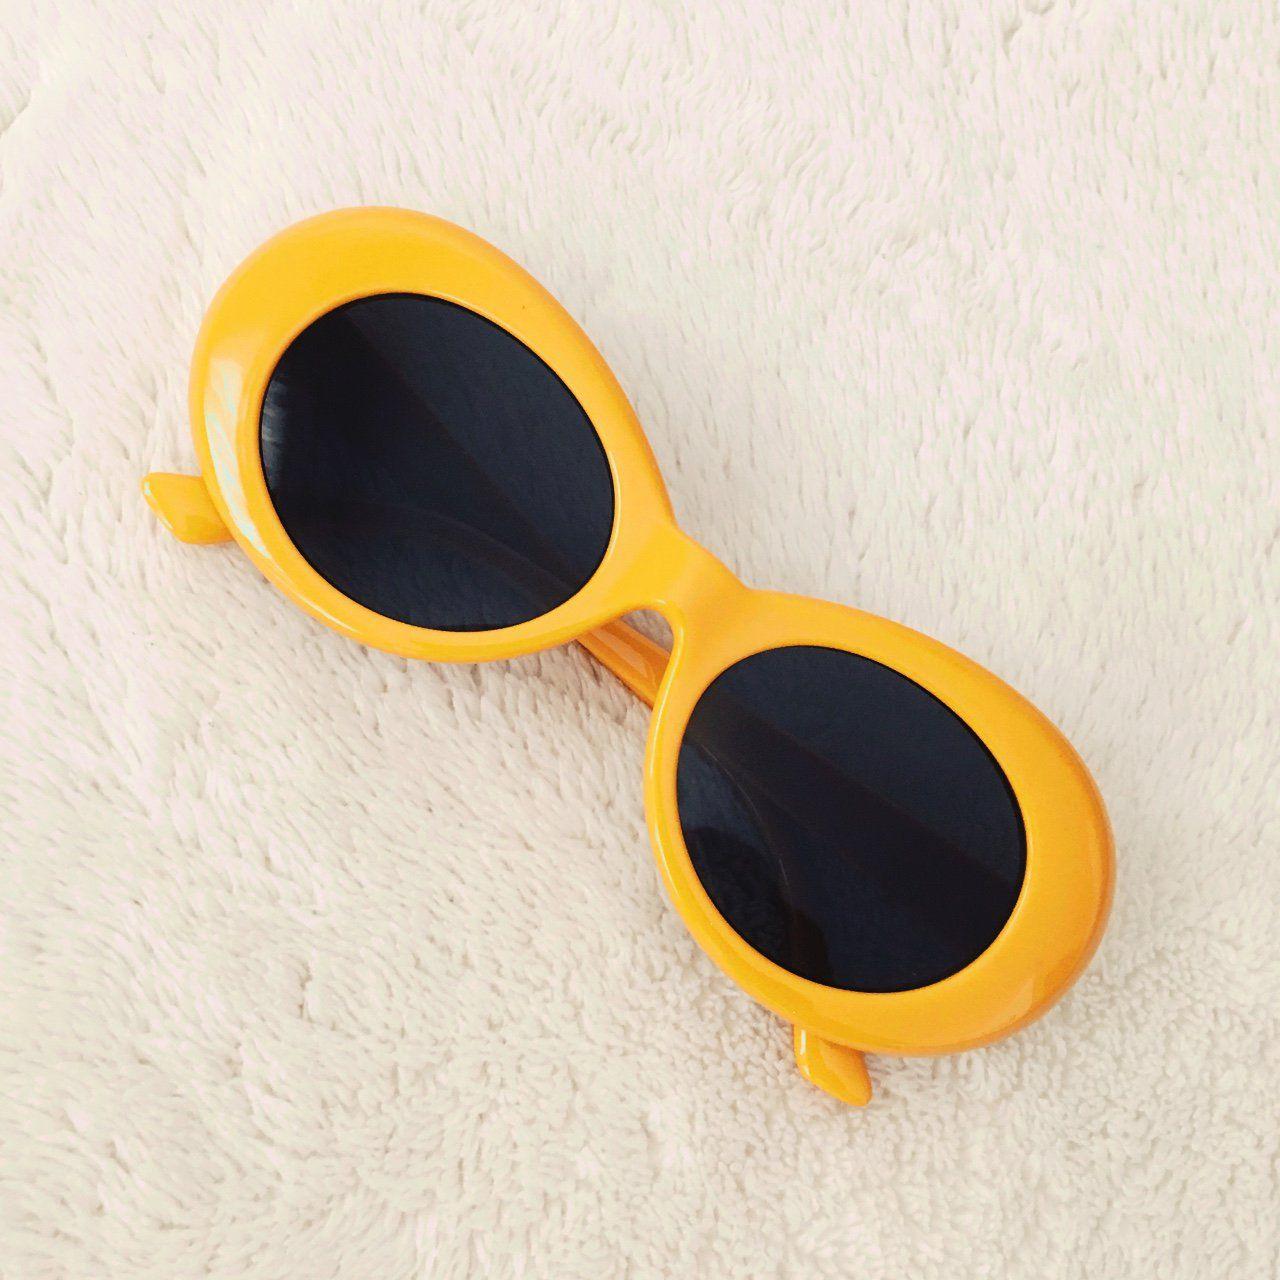 df709bfc571 Retro inspired sunglasses